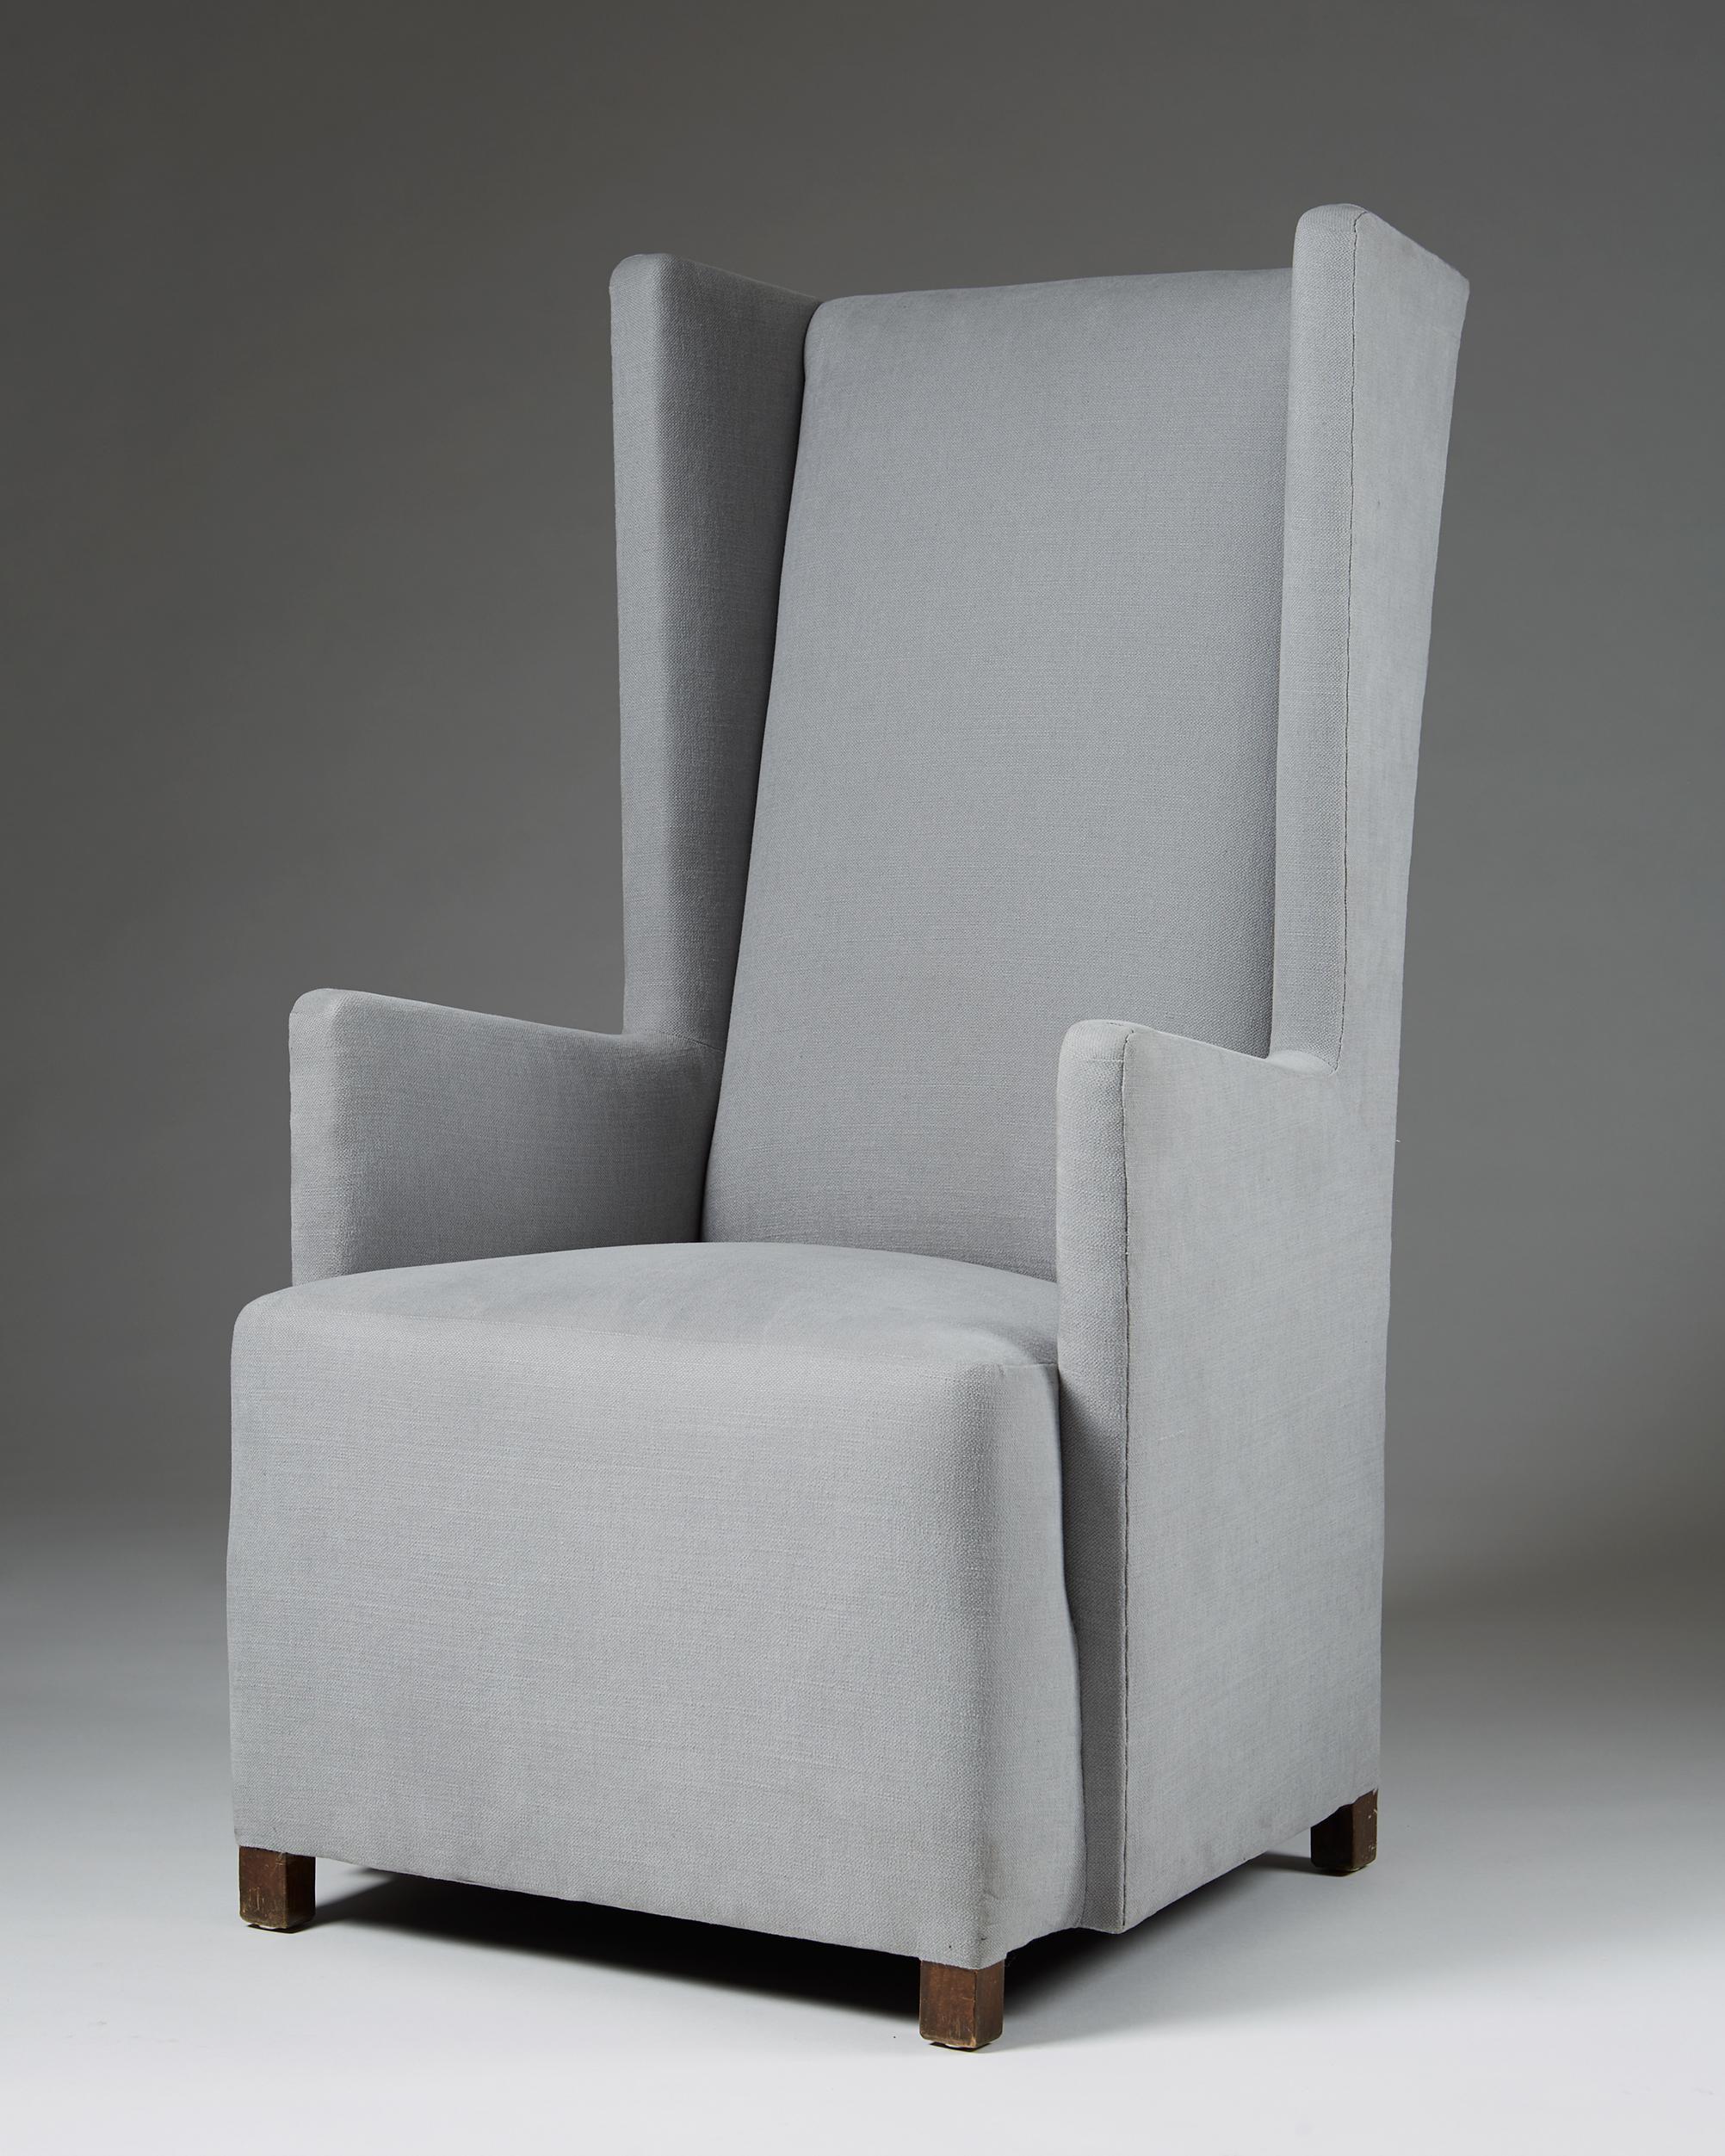 Uno Åhrén or Björn Trägårdh Armchair  Sweden, 1930's Wool upholstery. 110 x 70 x 63 cm Seat: 41 cm